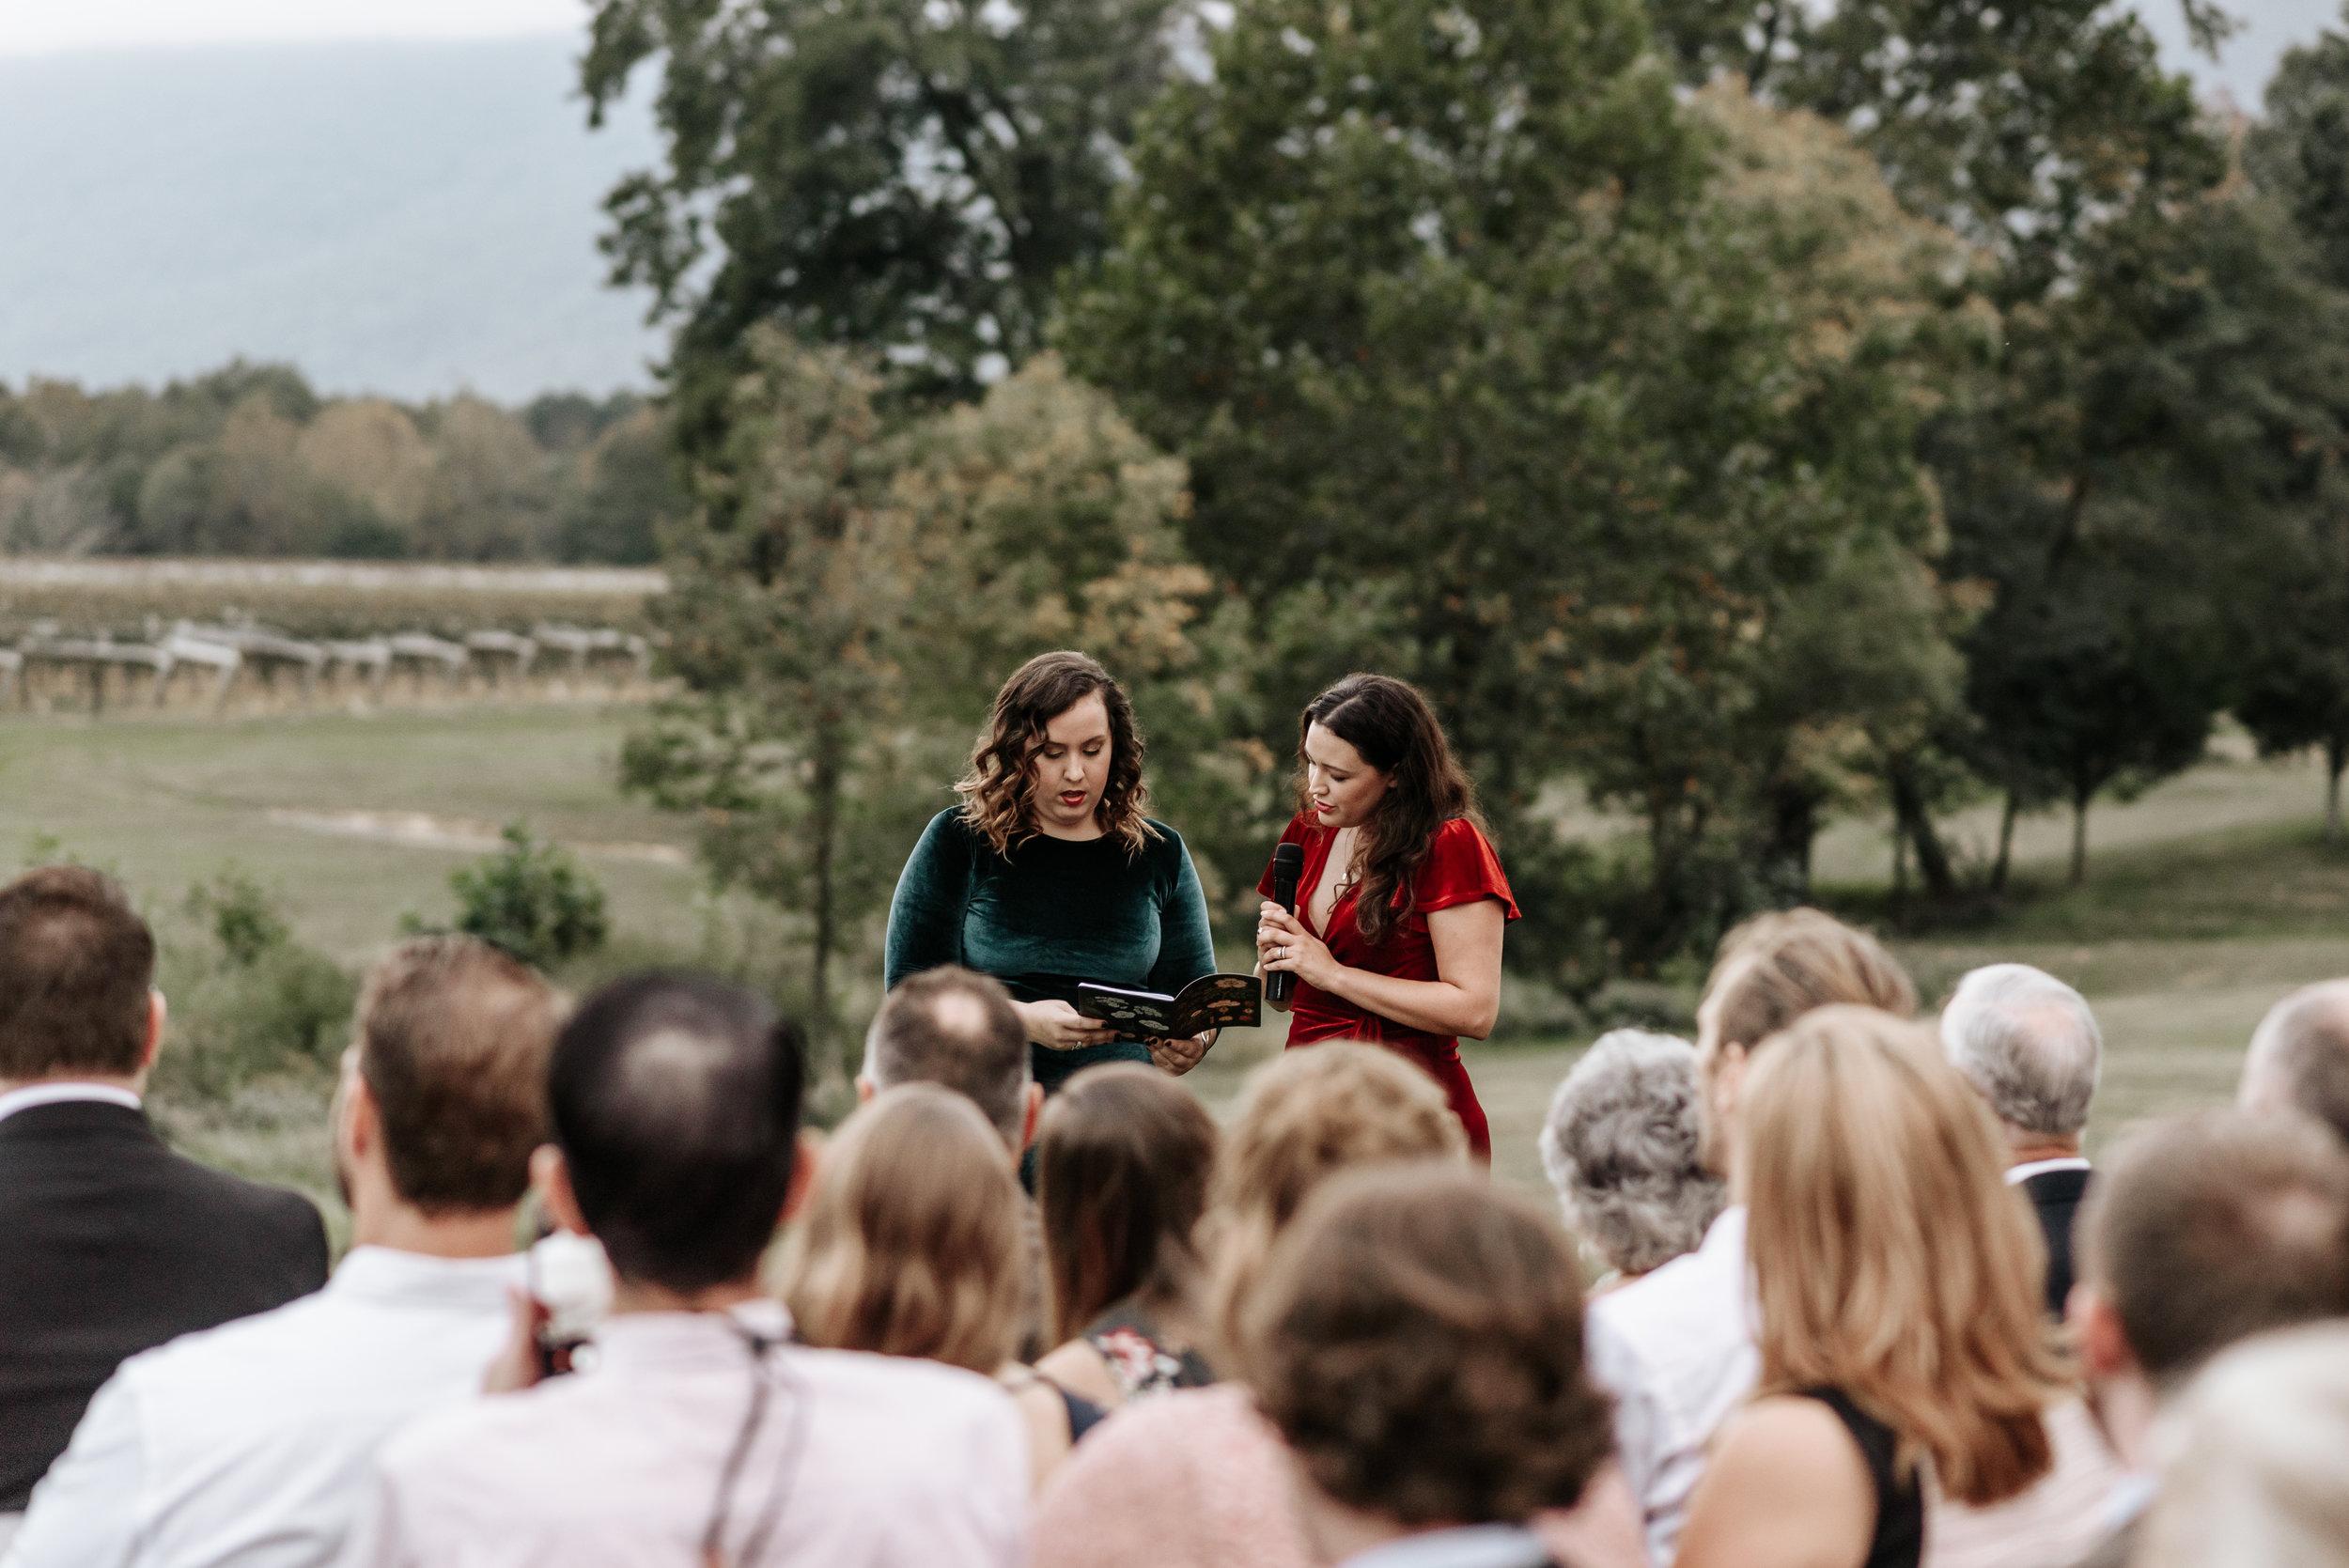 Veritas-Vineyards-and-Winery-Wedding-Photography-Afton-Virginia-Yasmin-Seth-Photography-by-V-2828.jpg